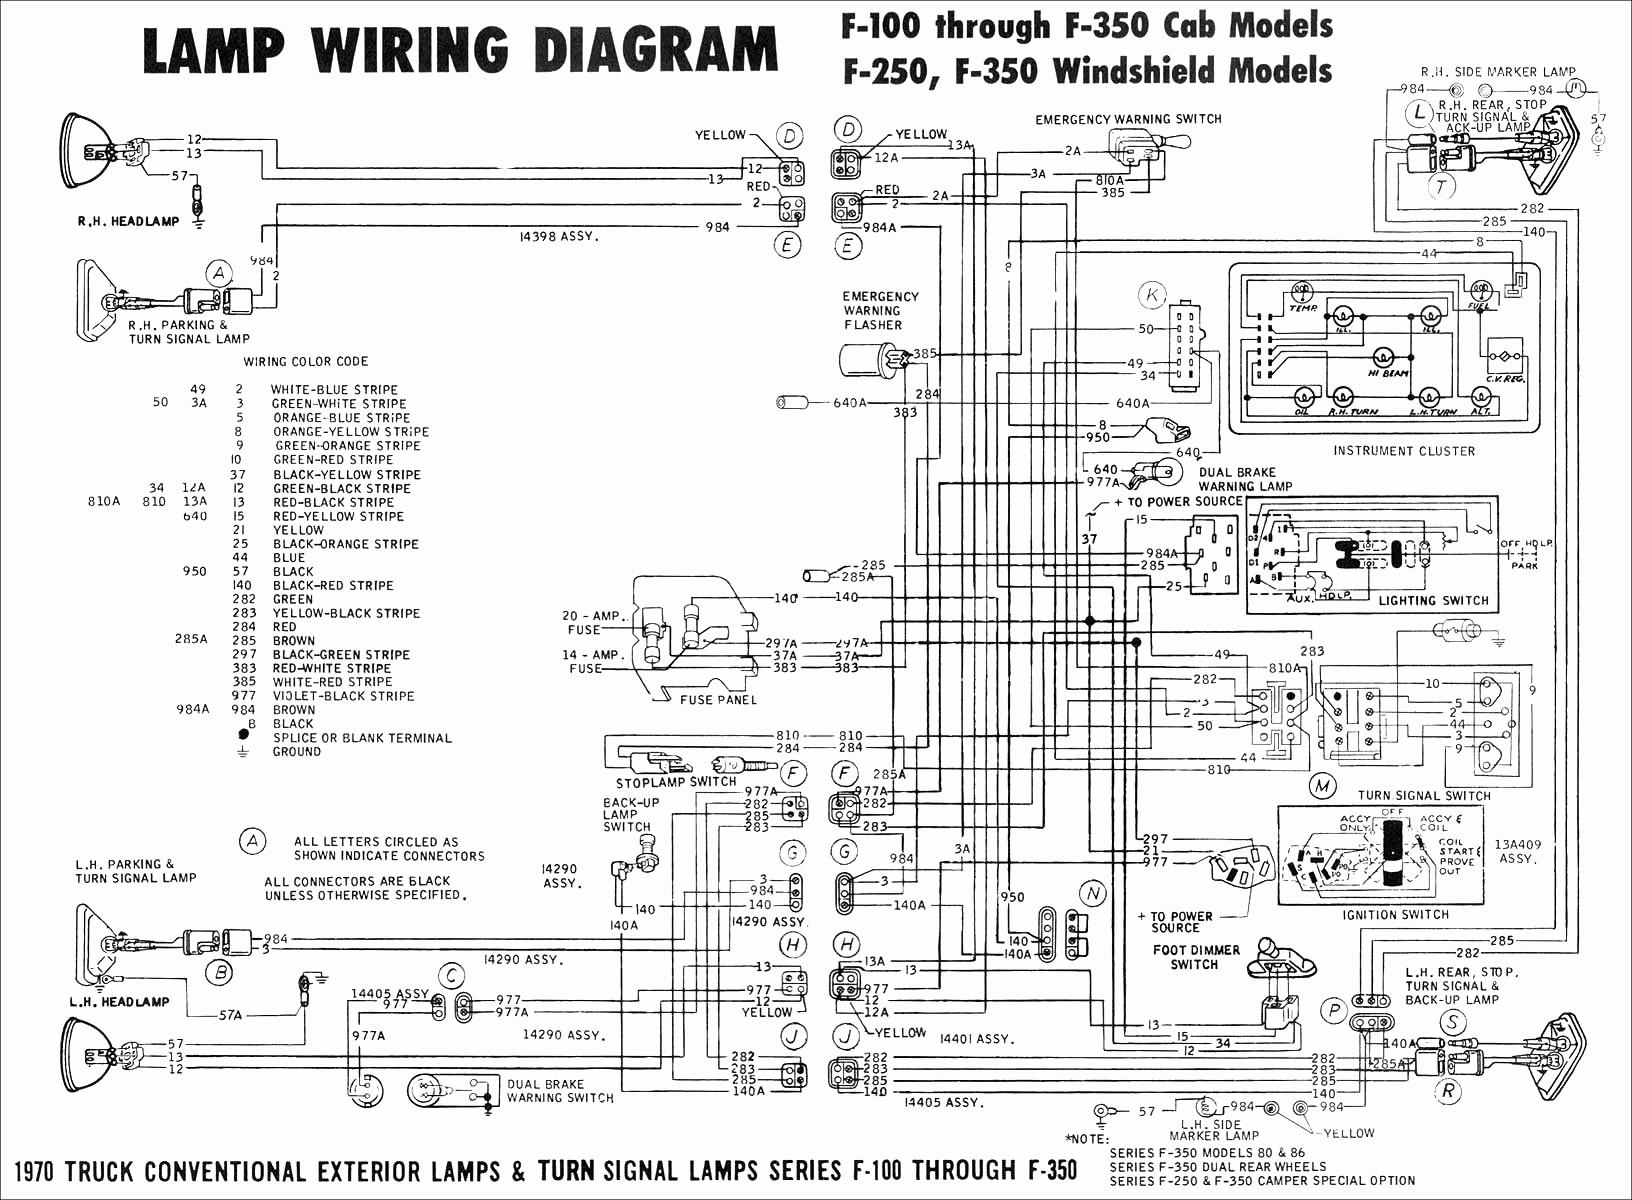 true tuc 27f wiring diagram Collection-True Tuc 27f Wiring Diagram New Wiring Diagram True Freezer T 49f Wiring Diagram New Free Wiring 6-p